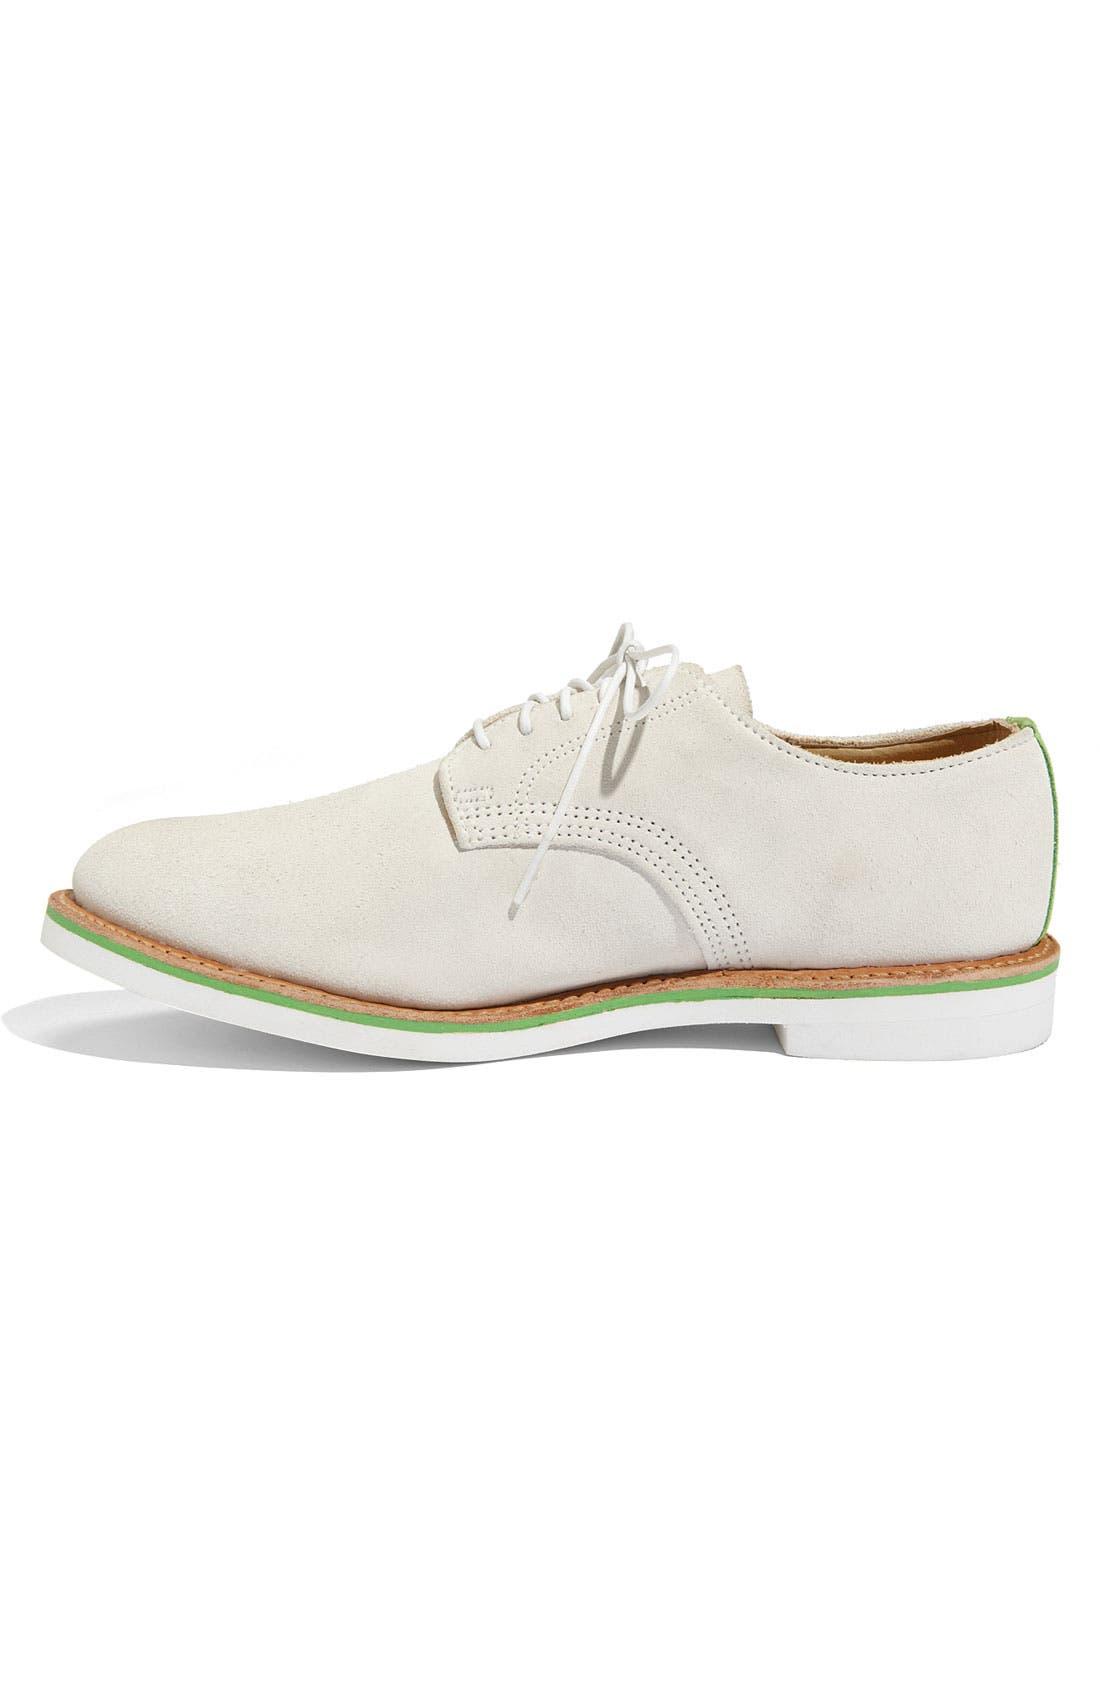 Alternate Image 2  - Walk-Over 'Derby' Buck Shoe